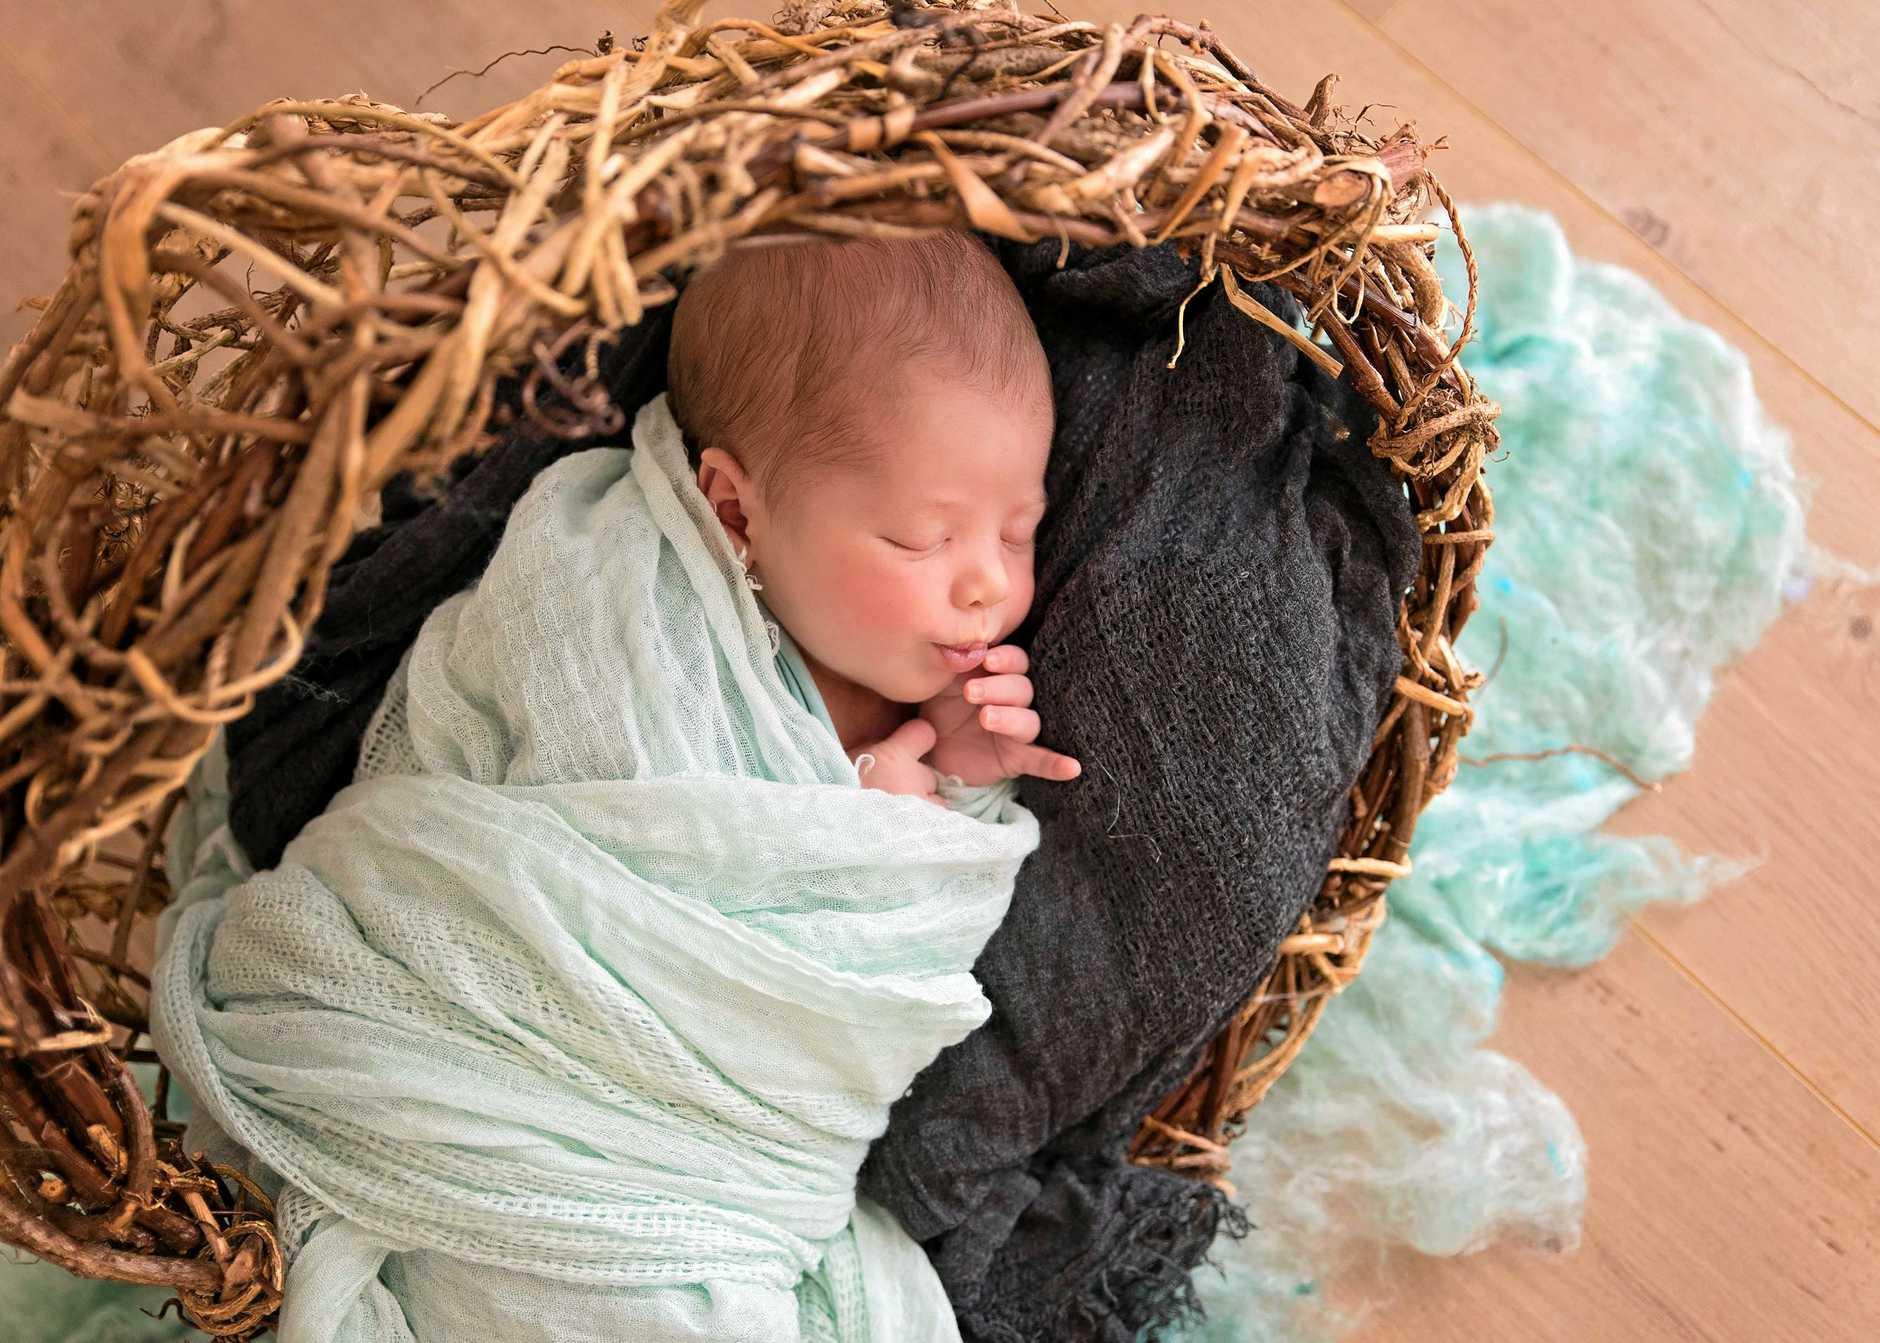 Jordan John Barker was born July 16, 2019.